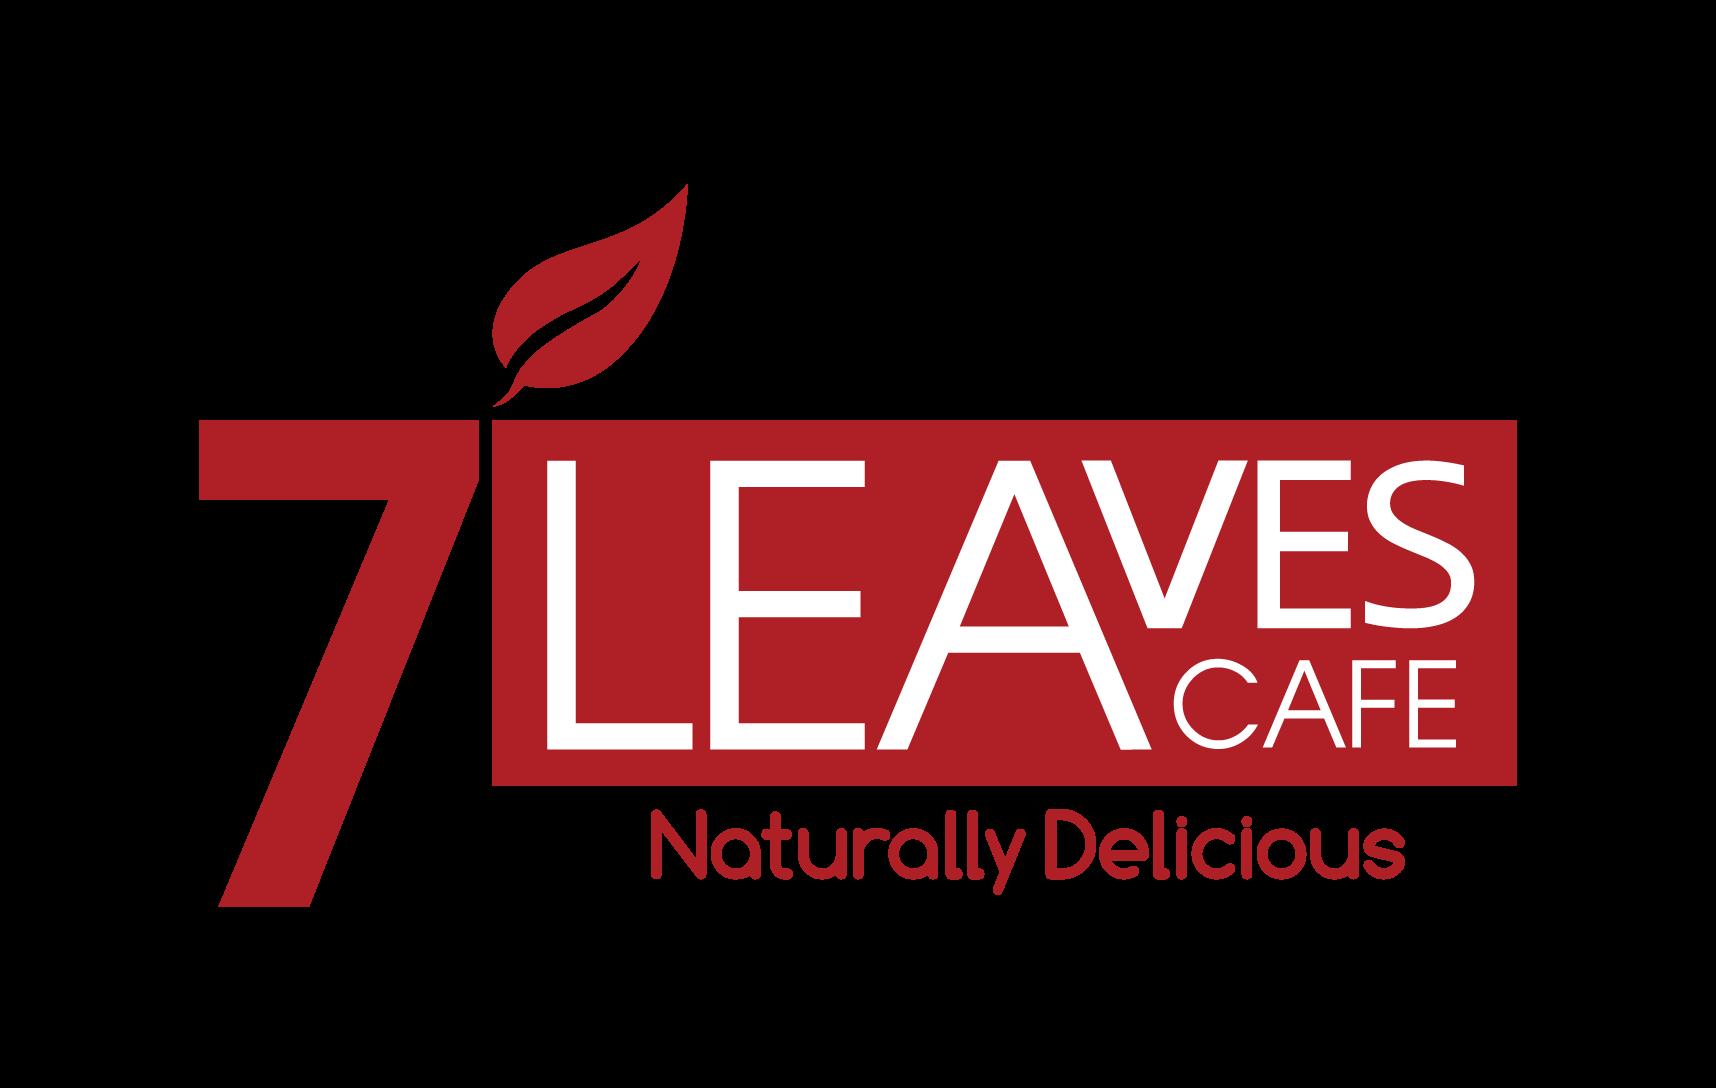 7 Leaves Customer Feedback Form